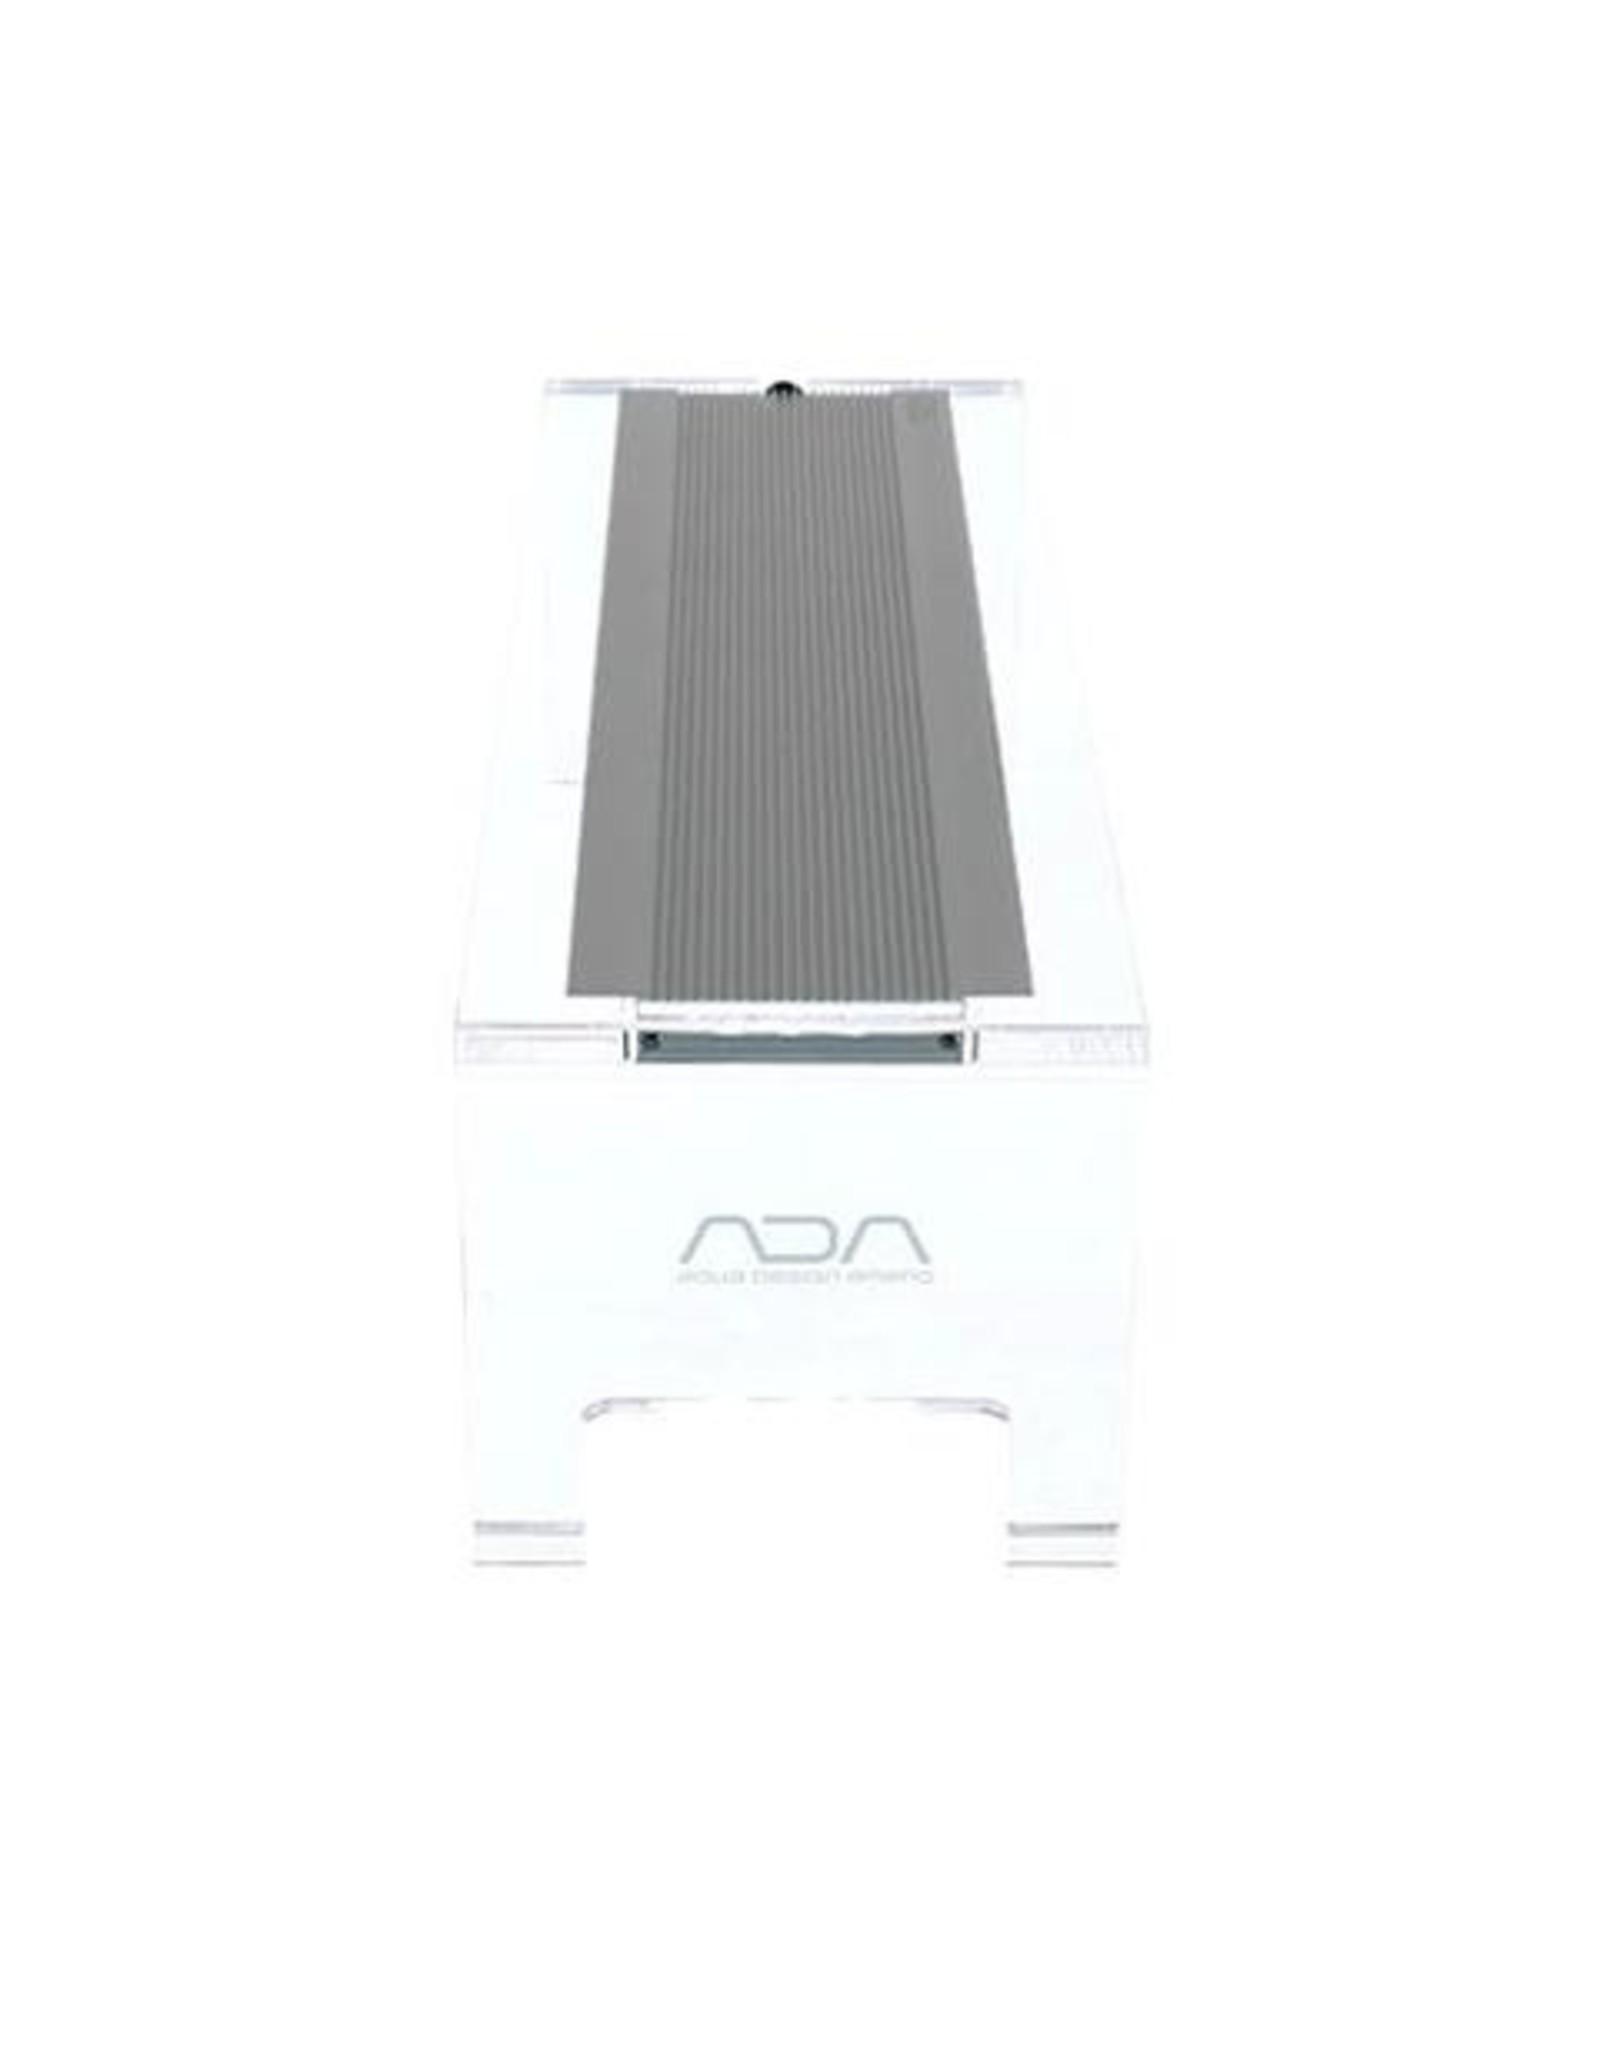 ADA ADA Aquasky G451